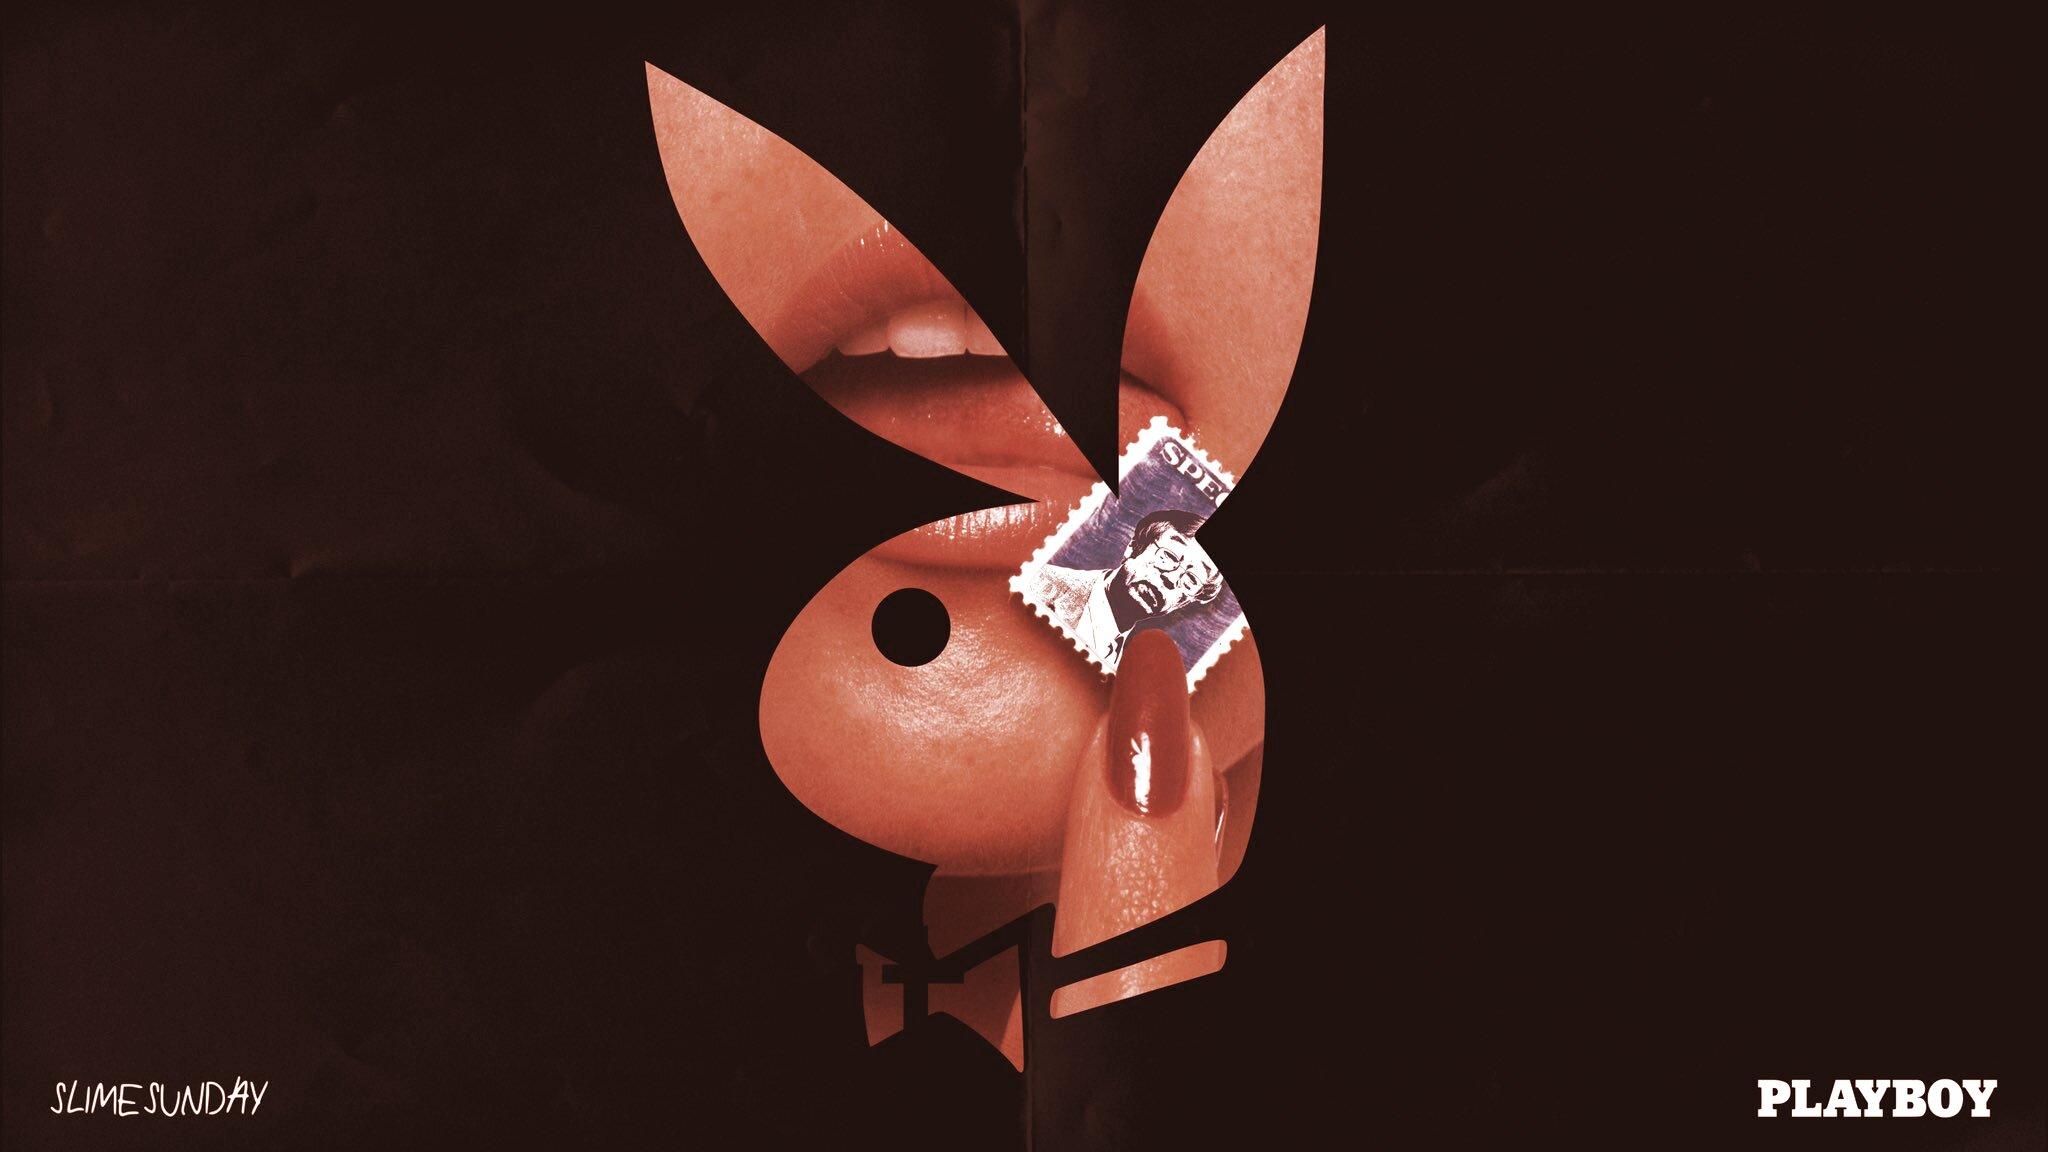 Playboy Unwraps Its Miami Beach NFT Collection